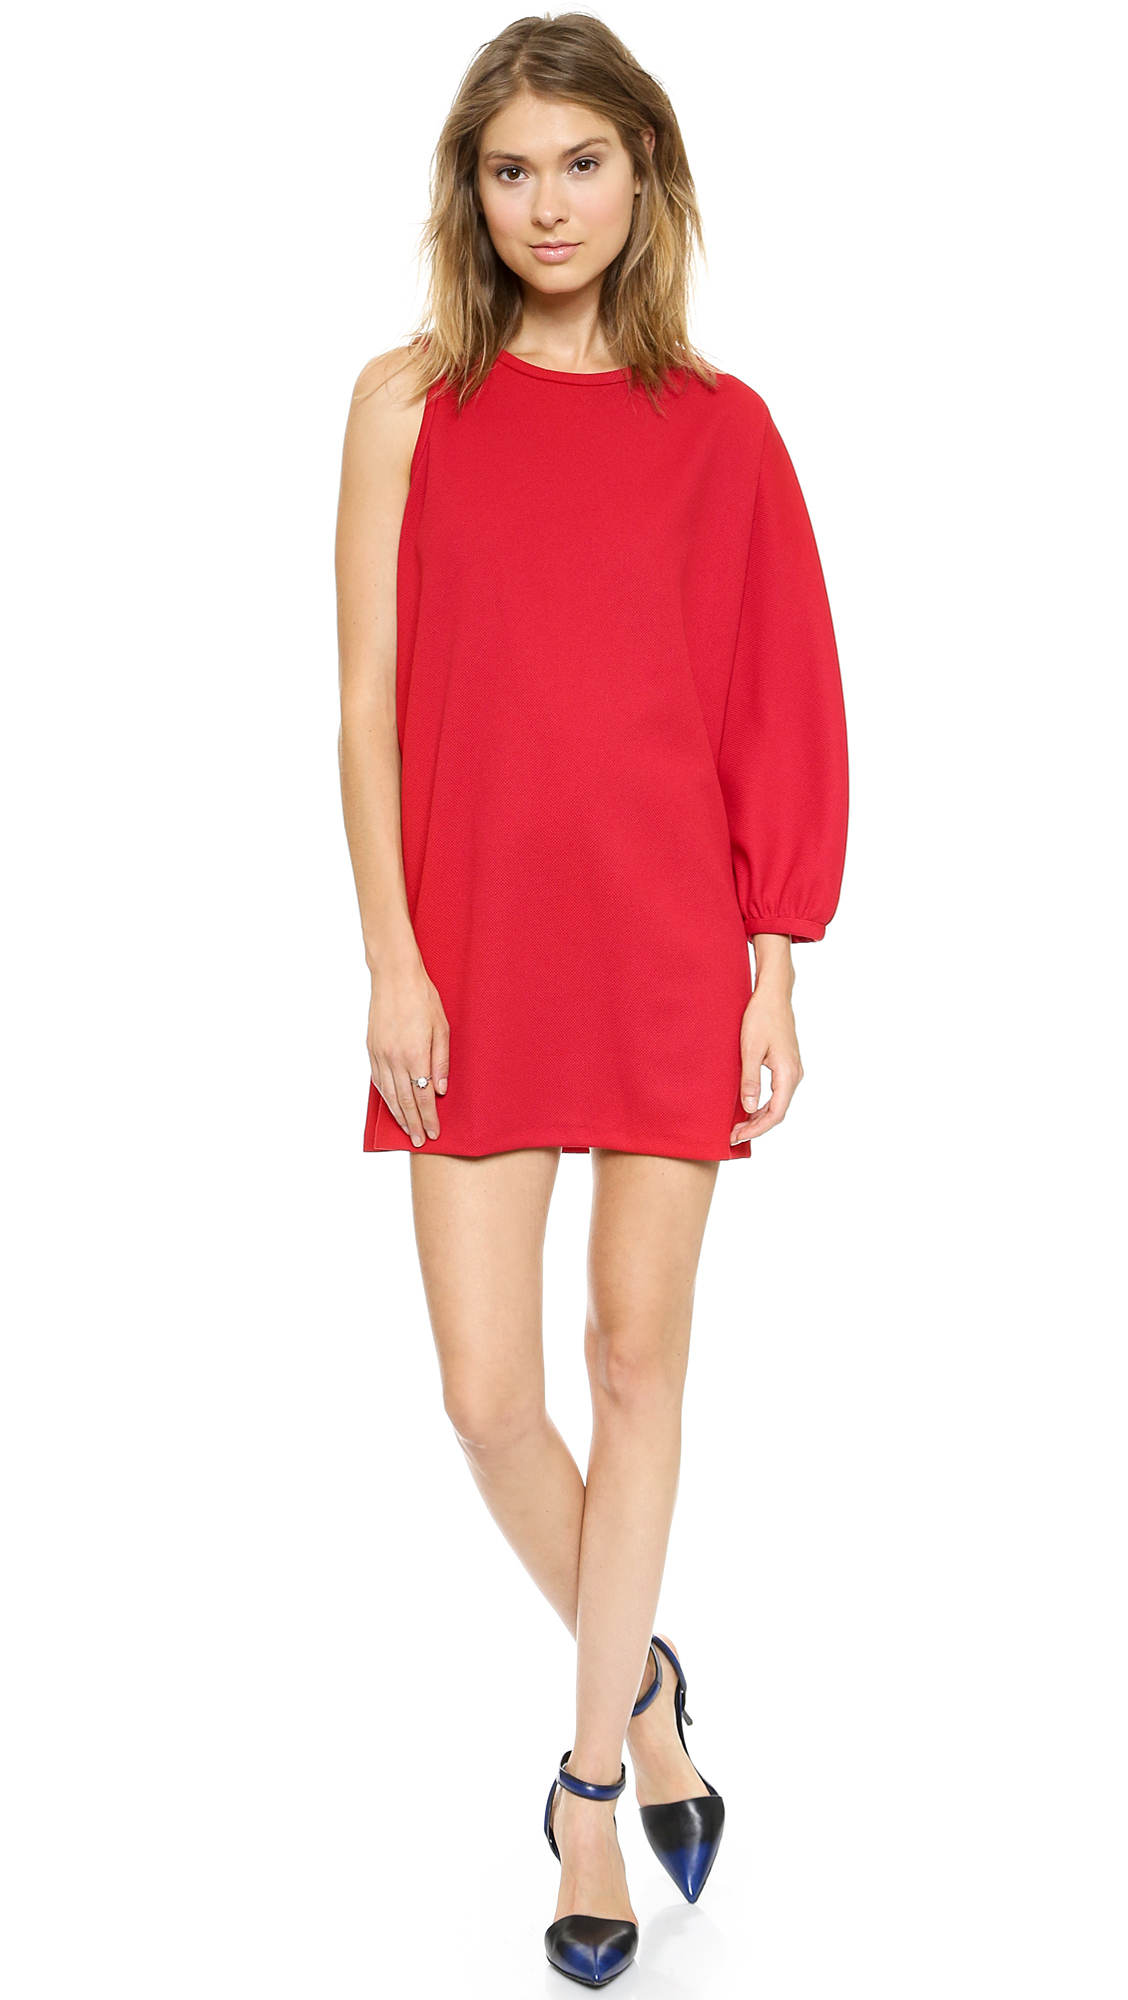 Cynthia Rowley Pique One Shoulder Tunic Black In Red Lyst